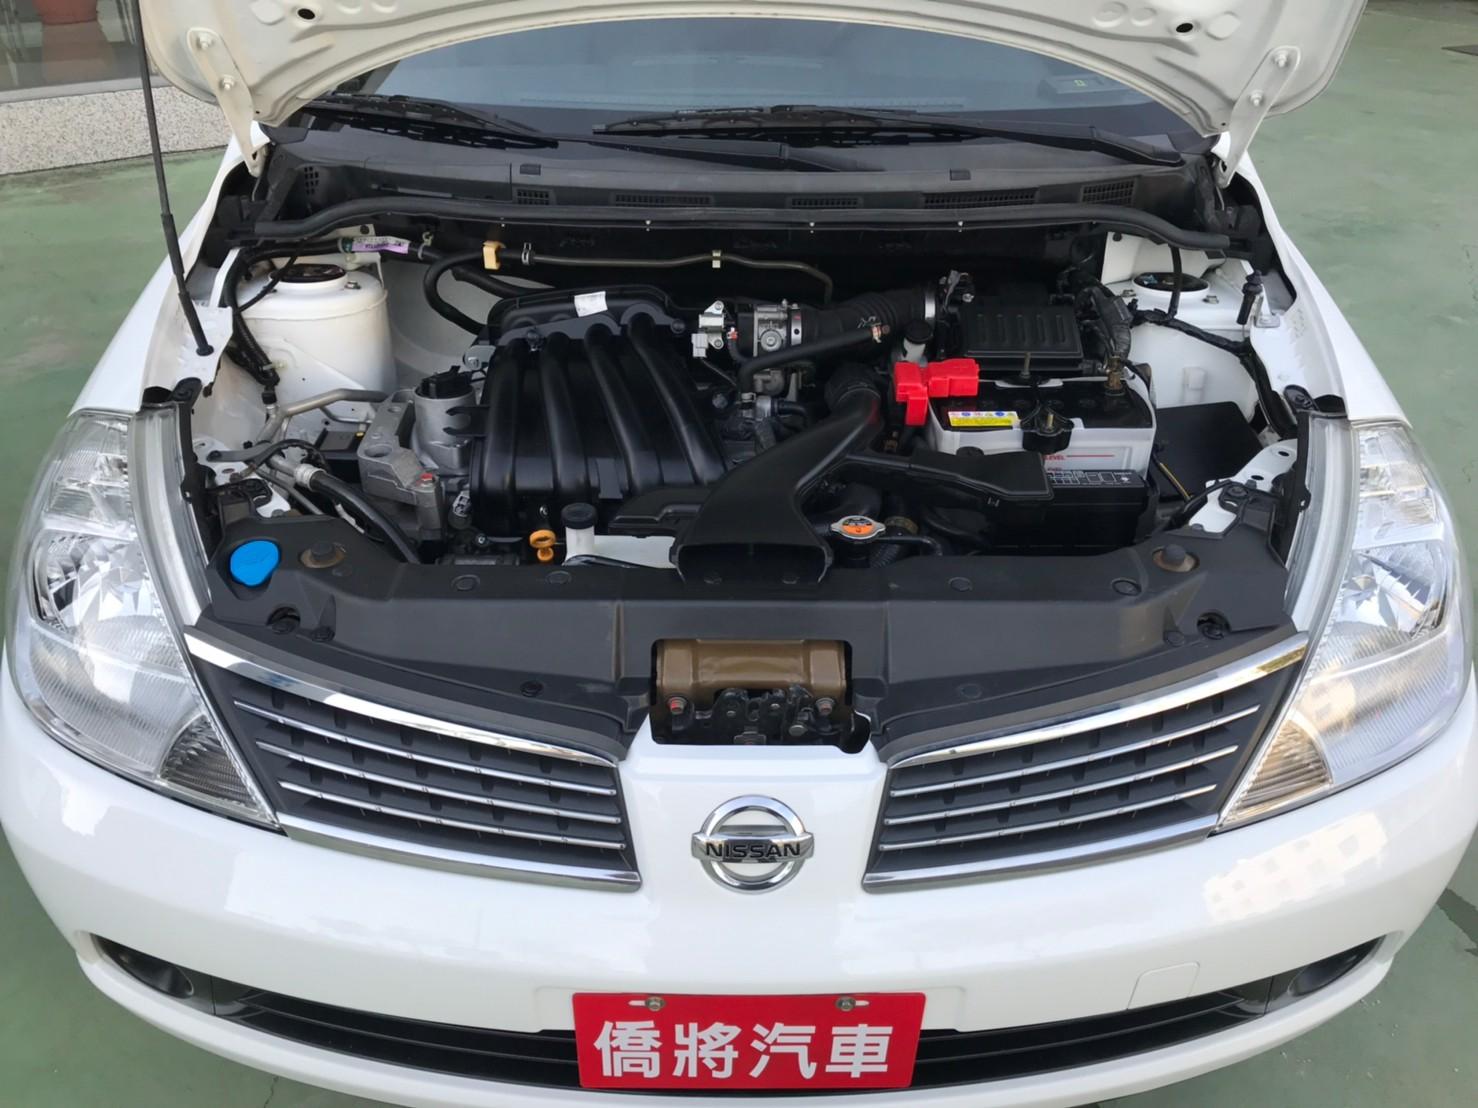 2017TIIDA 4D 里程保證 認證車 白色黑內裝 代步上課通勤好停車 SUM29.8 1.6c_210615_4